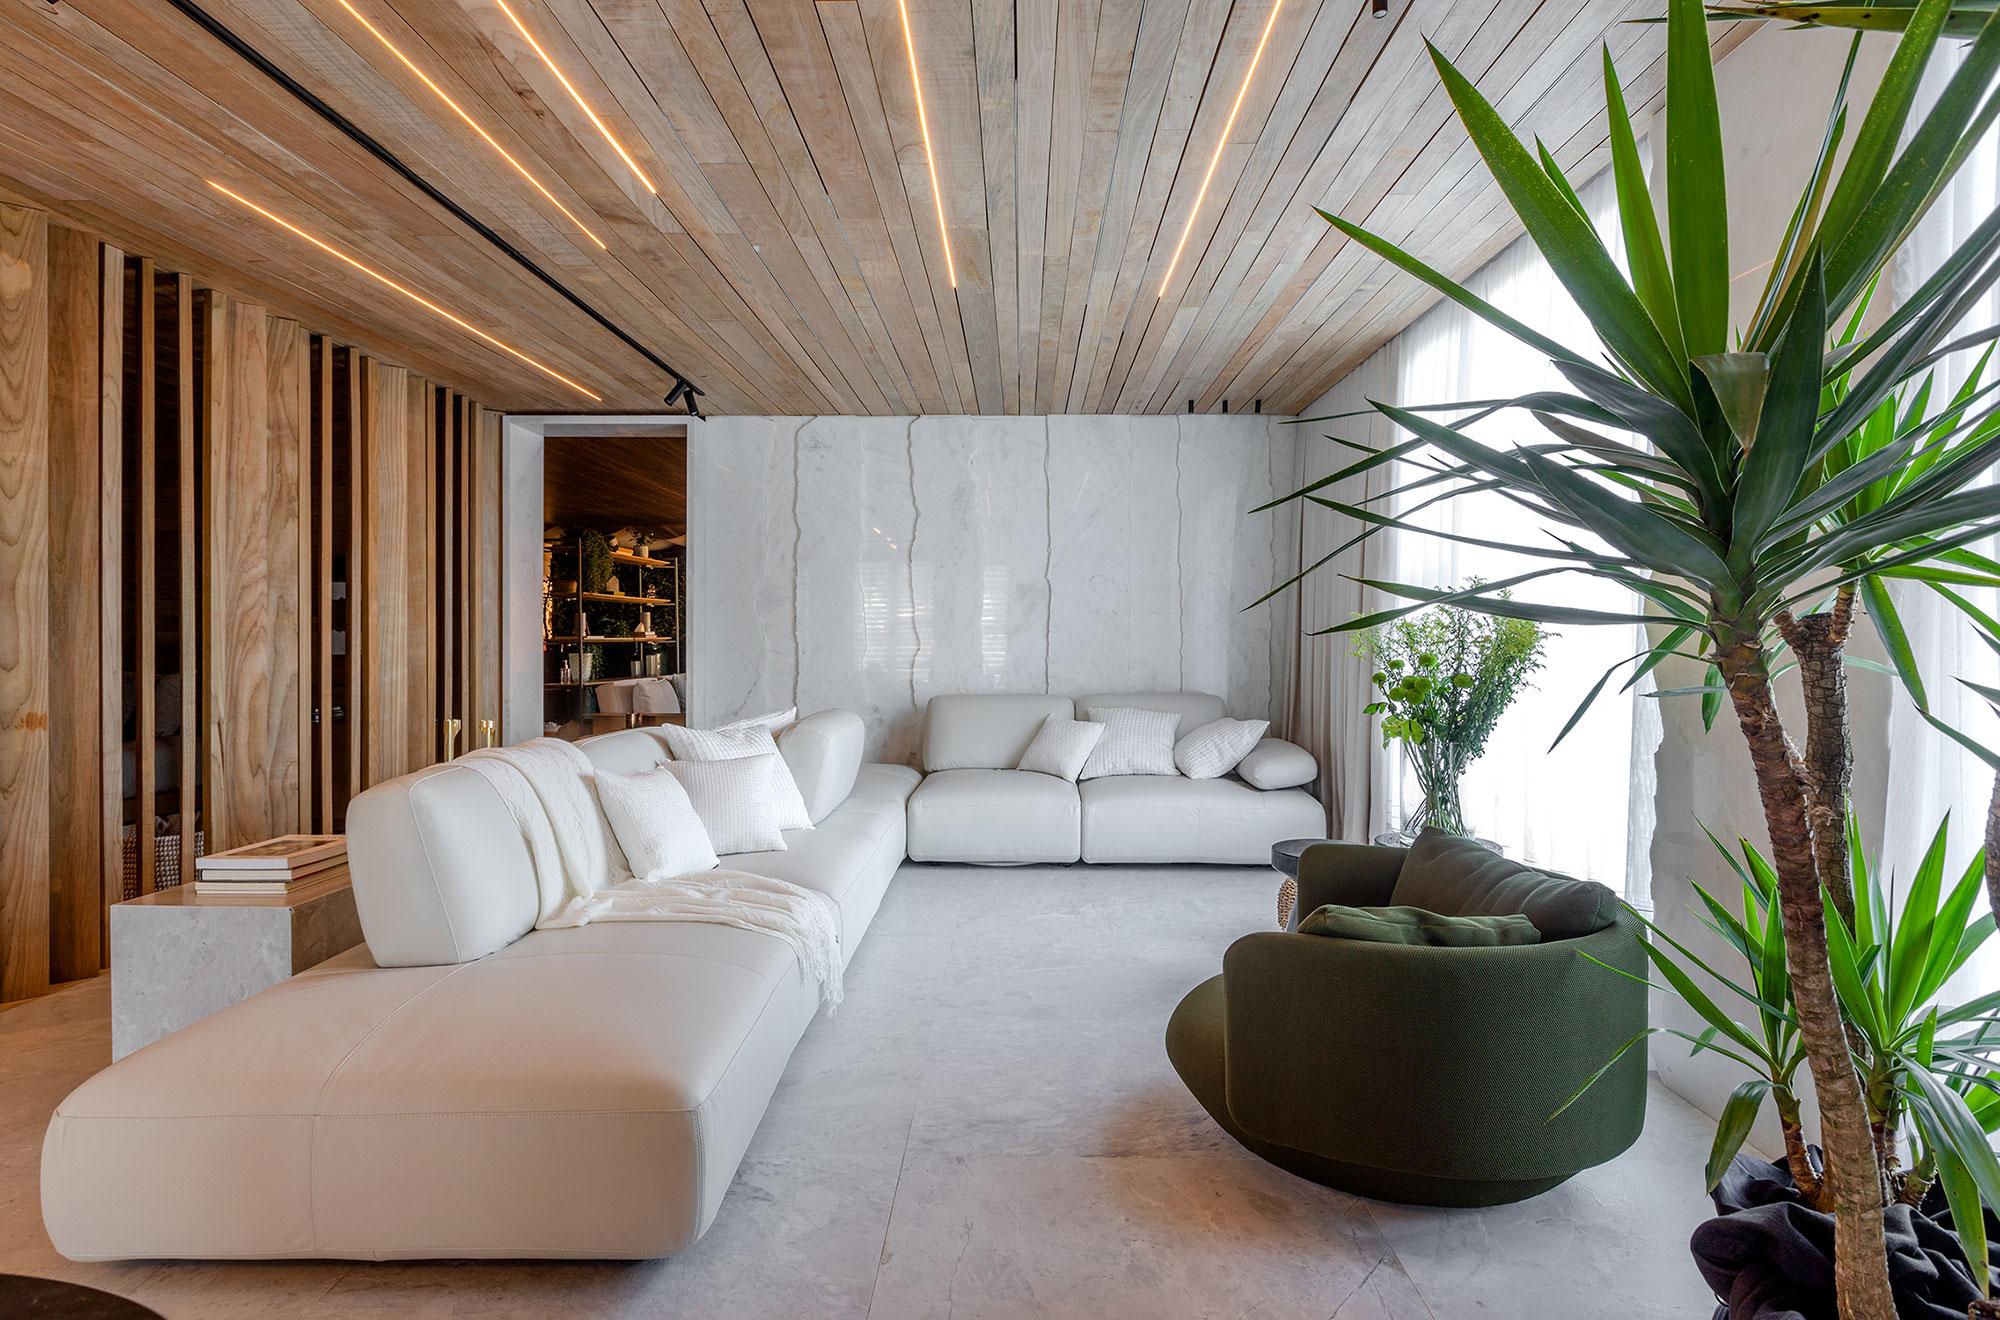 Loft Naturalle - Michael Zanghelini - CASACOR SC 2021